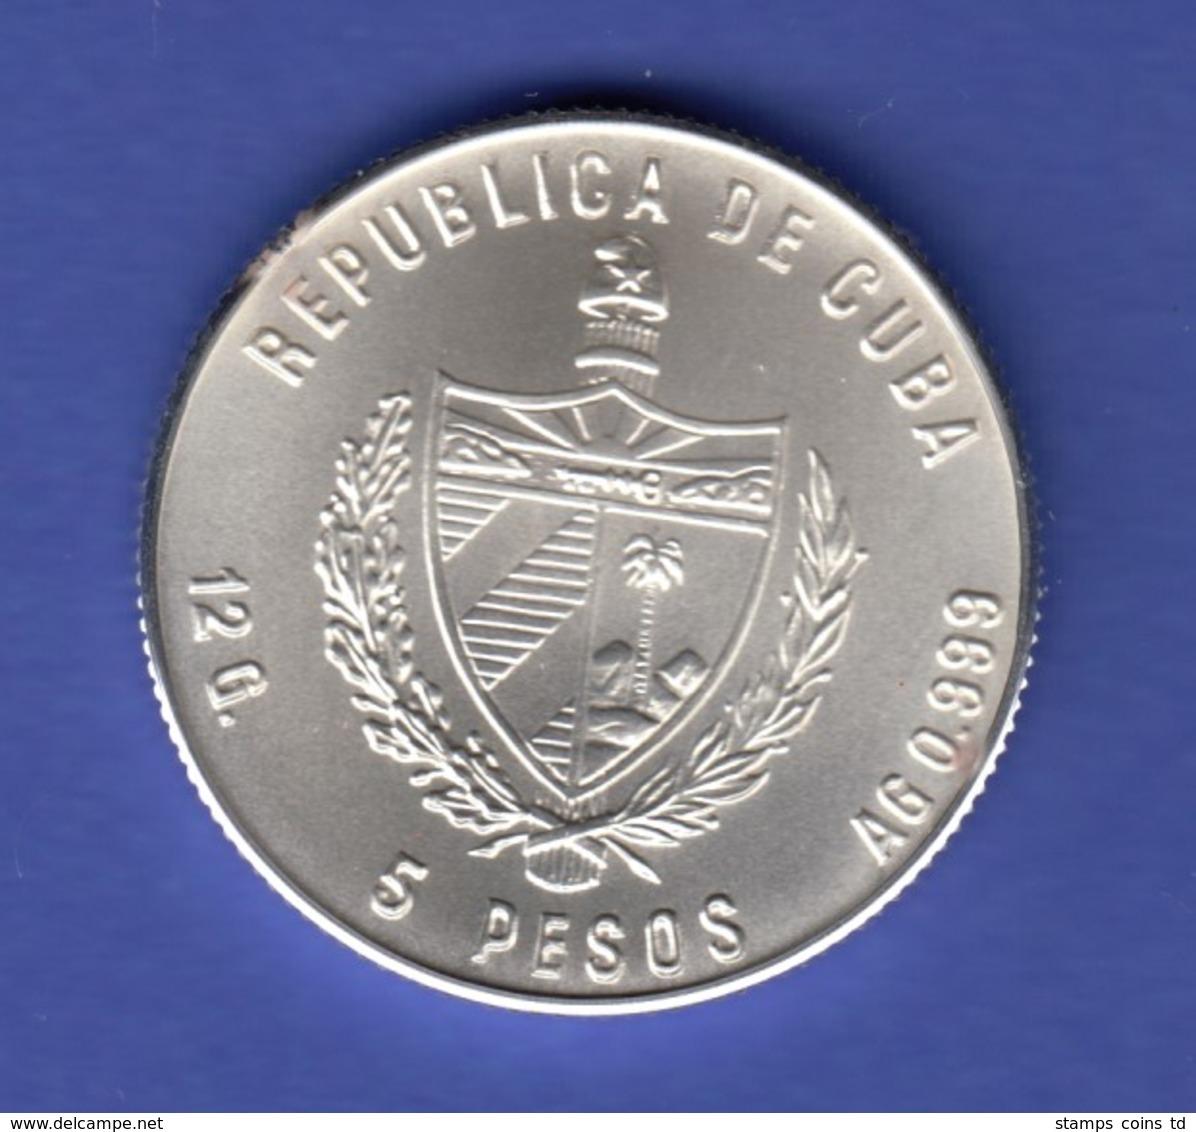 Cuba 5 Peso - Fußball Weltmeisterschaft 1986 In Mexico Ag999 - Autres – Amérique